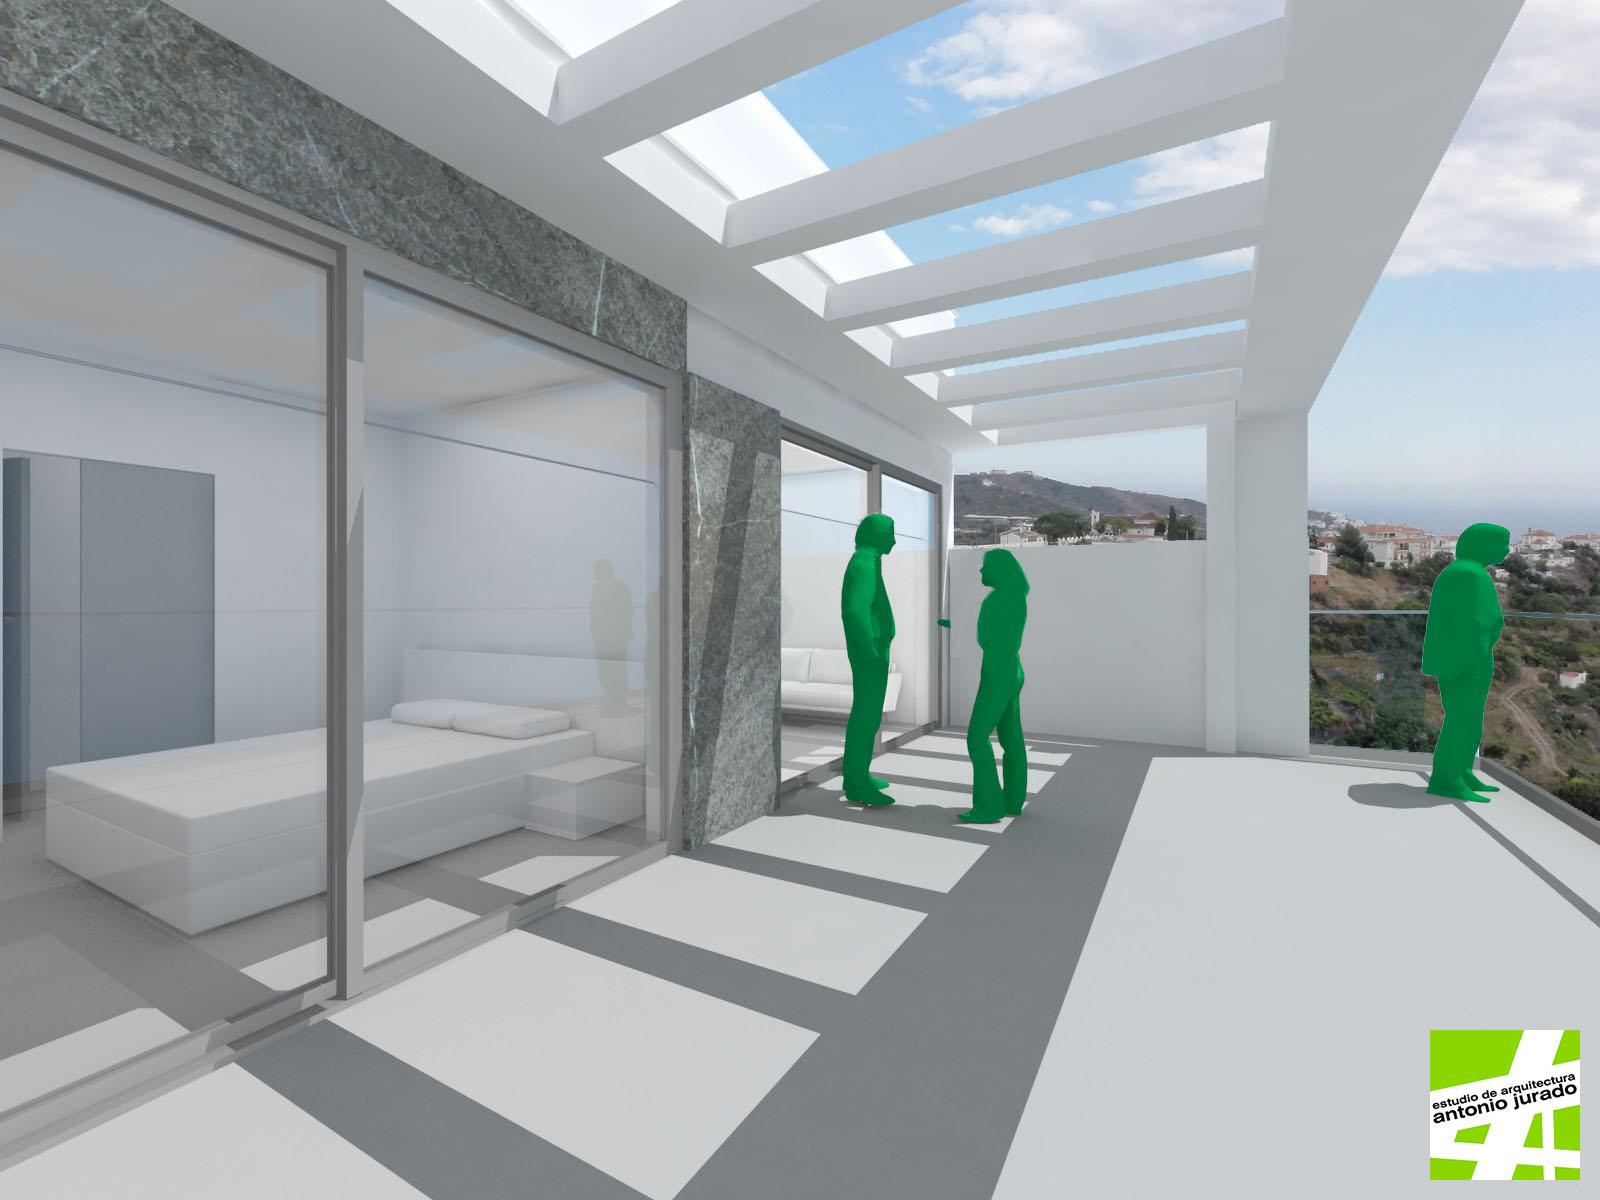 casa-ra-house-torrox-malaga-antonio-jurado-arquitecto-09